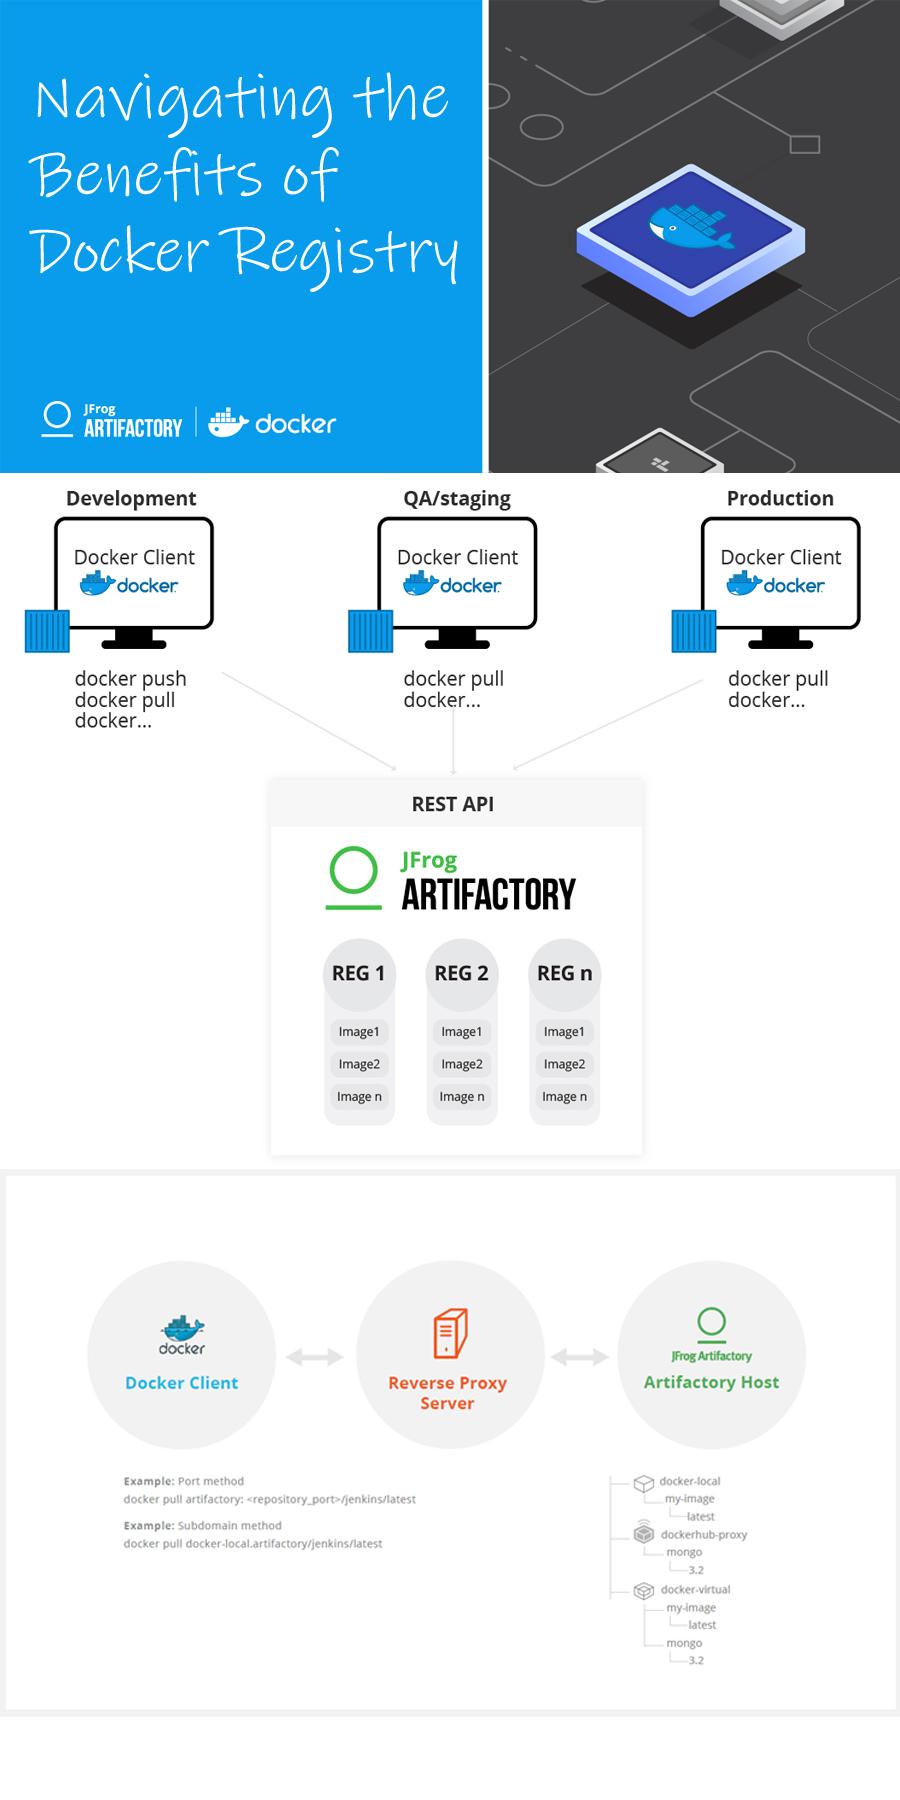 Navigating the Benefits of Docker Registry